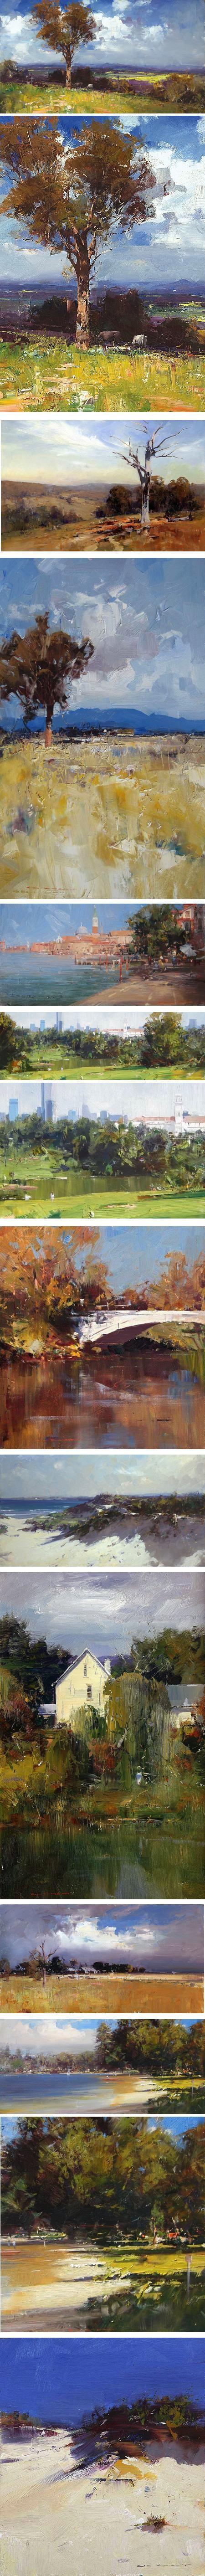 Ken Knight, Australian plein air painter